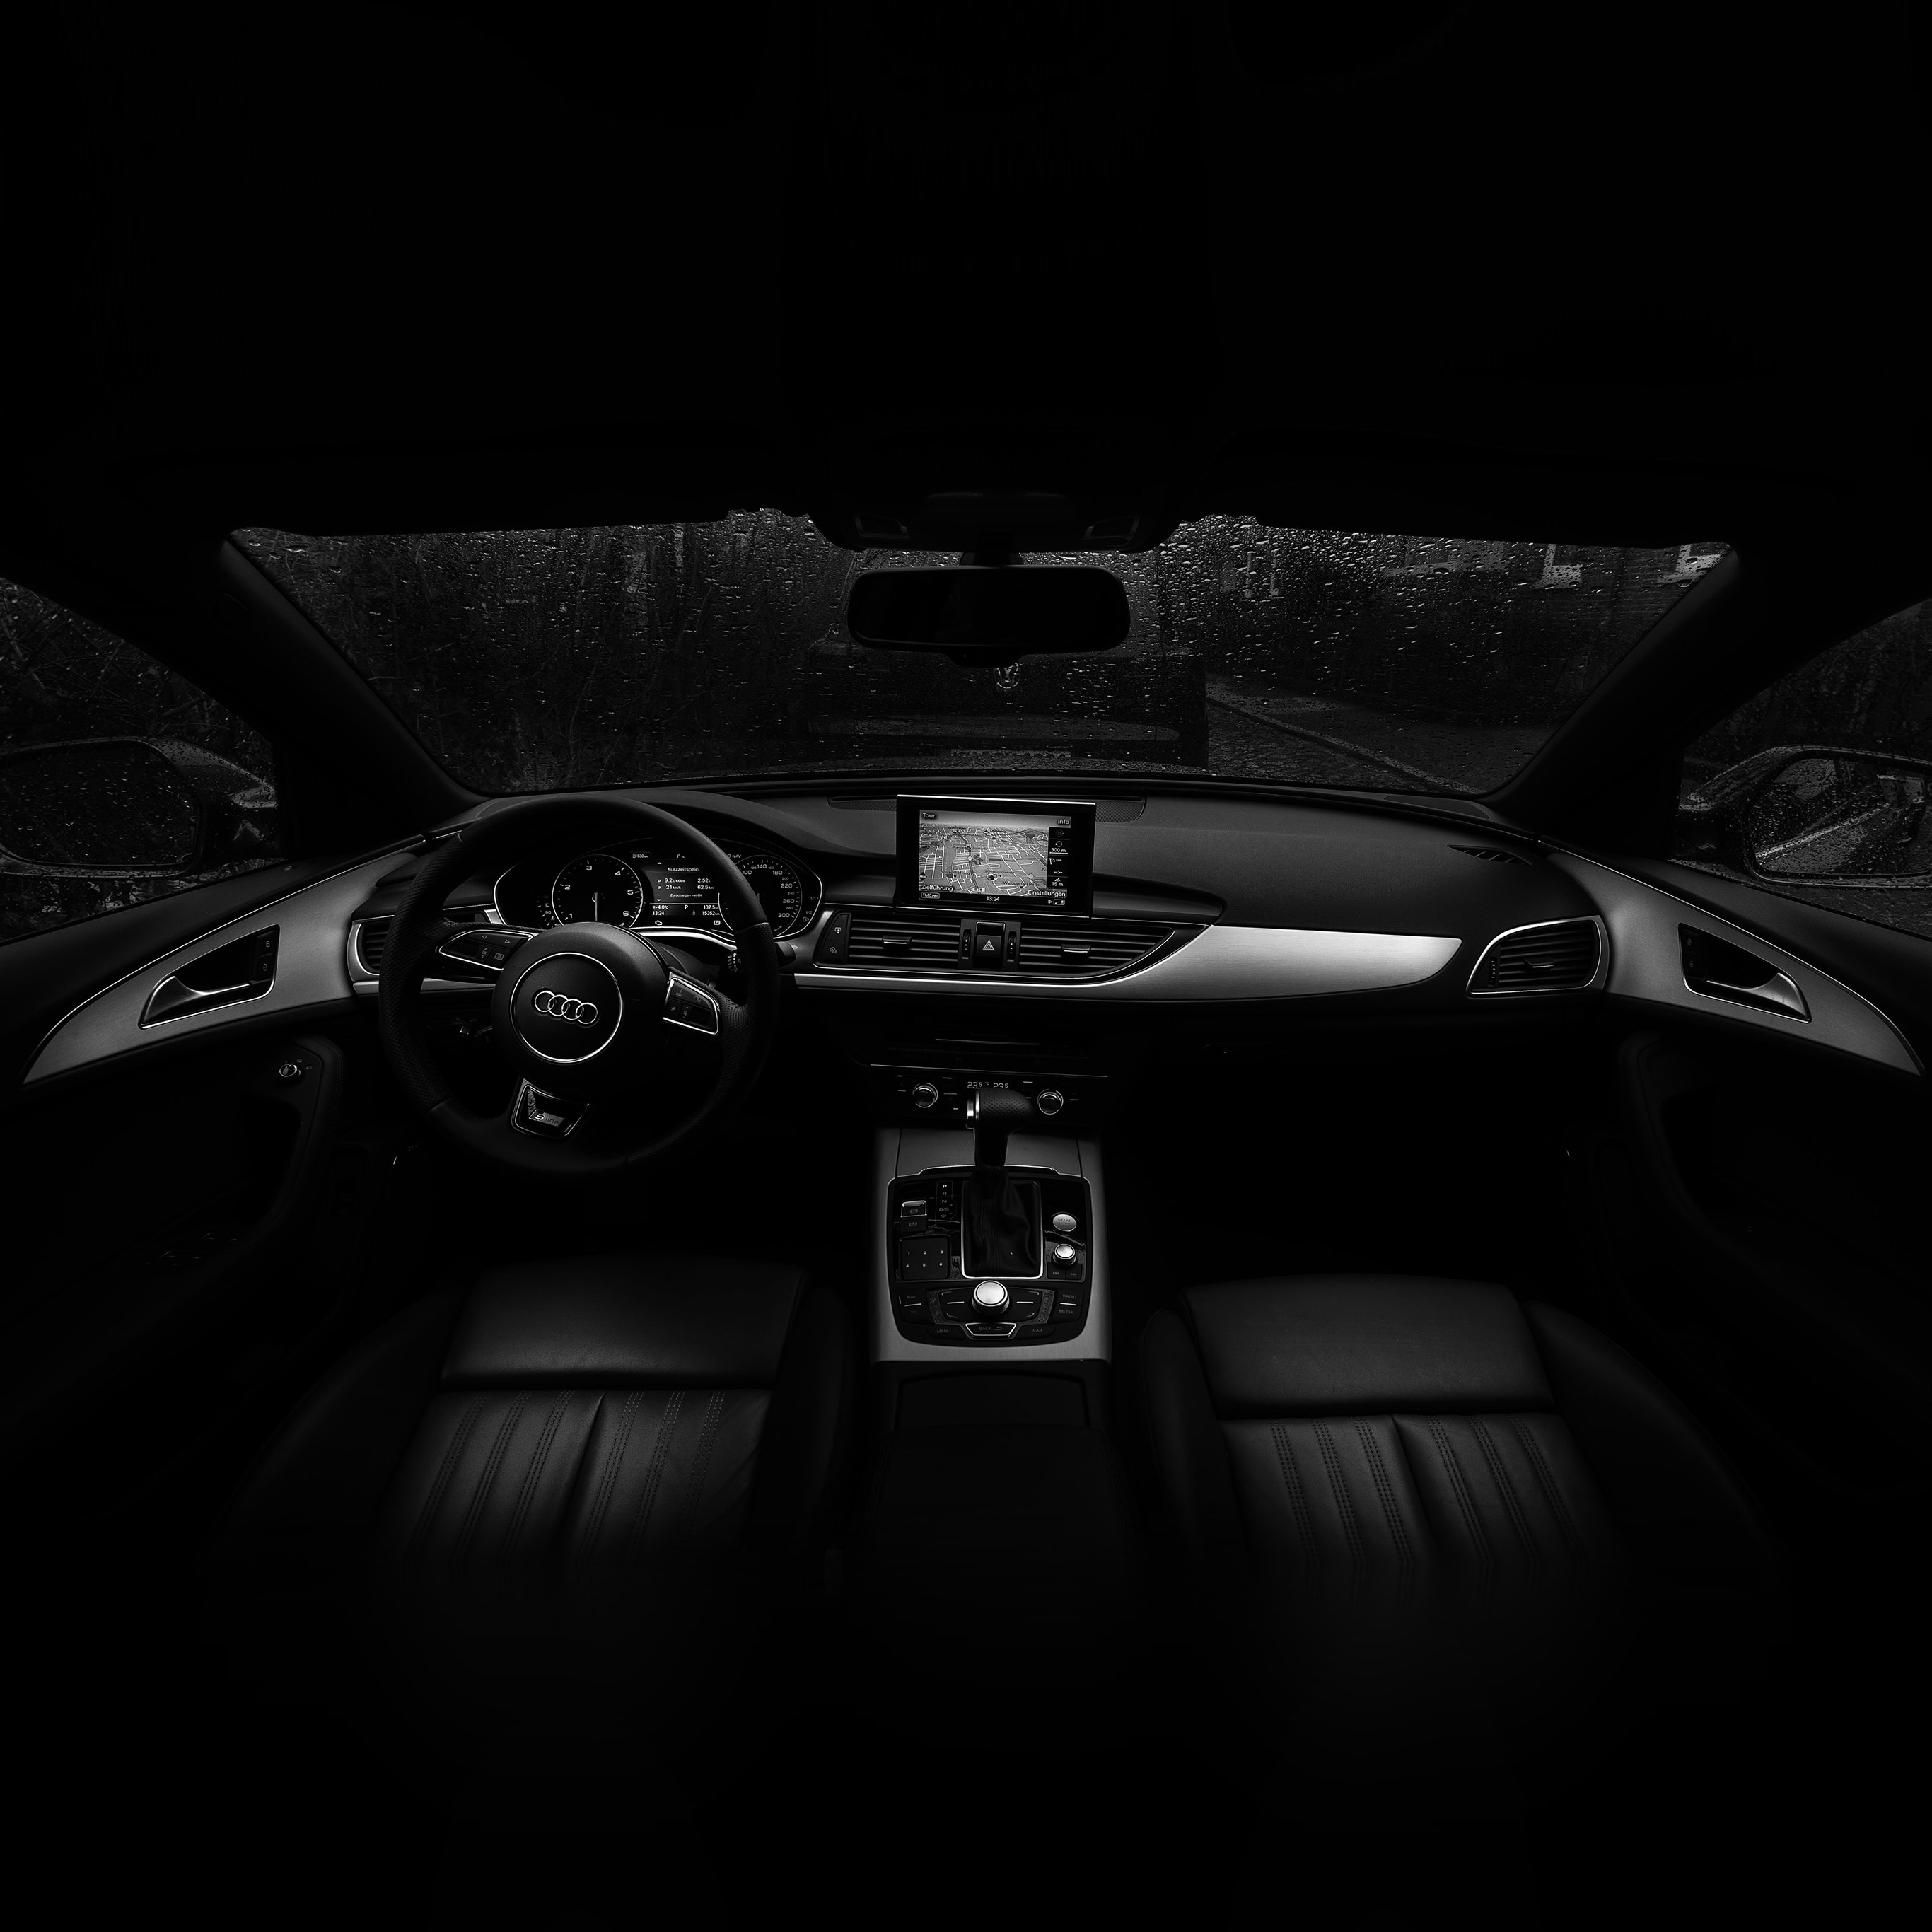 No06 Audi Car Interior Dark Bw Wallpaper